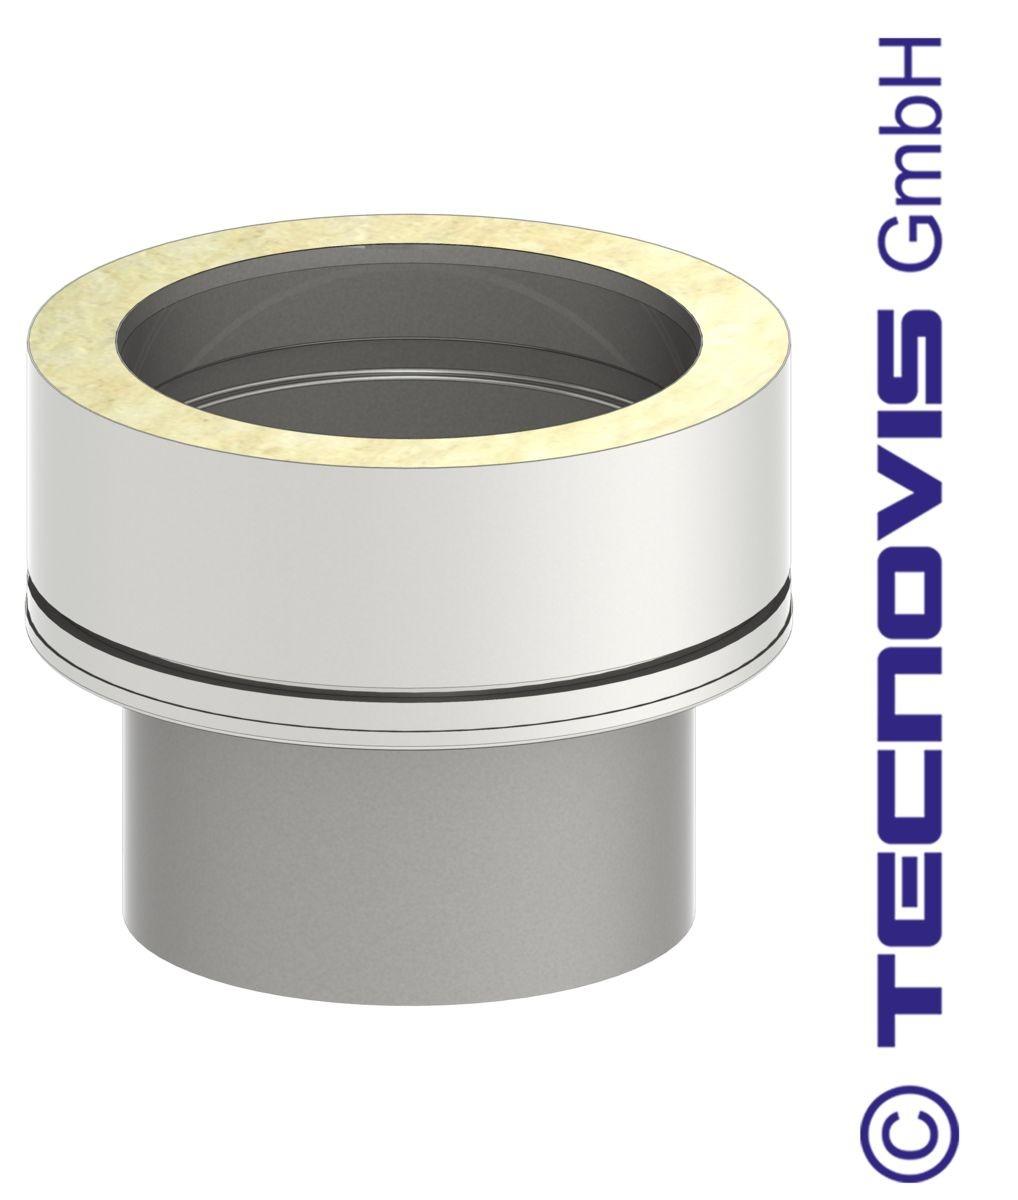 Adaptateur INOX simple - double paroi 180 mm